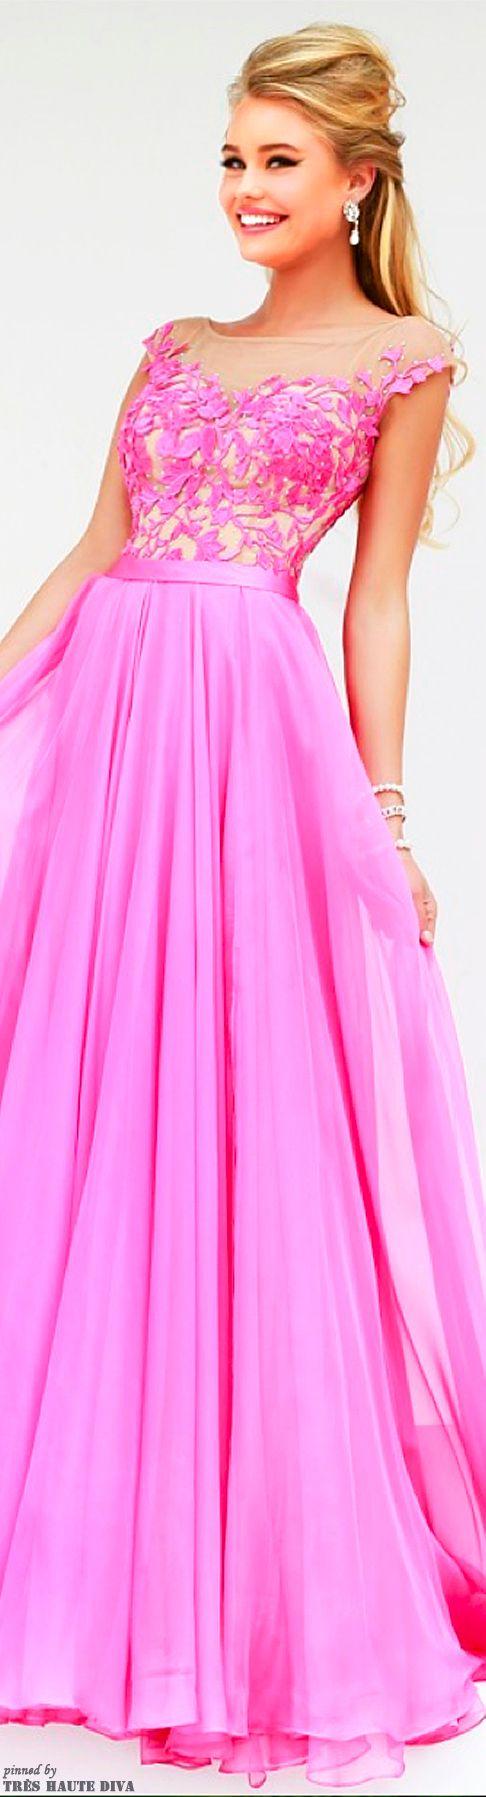 Sherri Hill Spring 2014 prom dress http://www.lunedress.com/prom-dresses-us63_1/p2